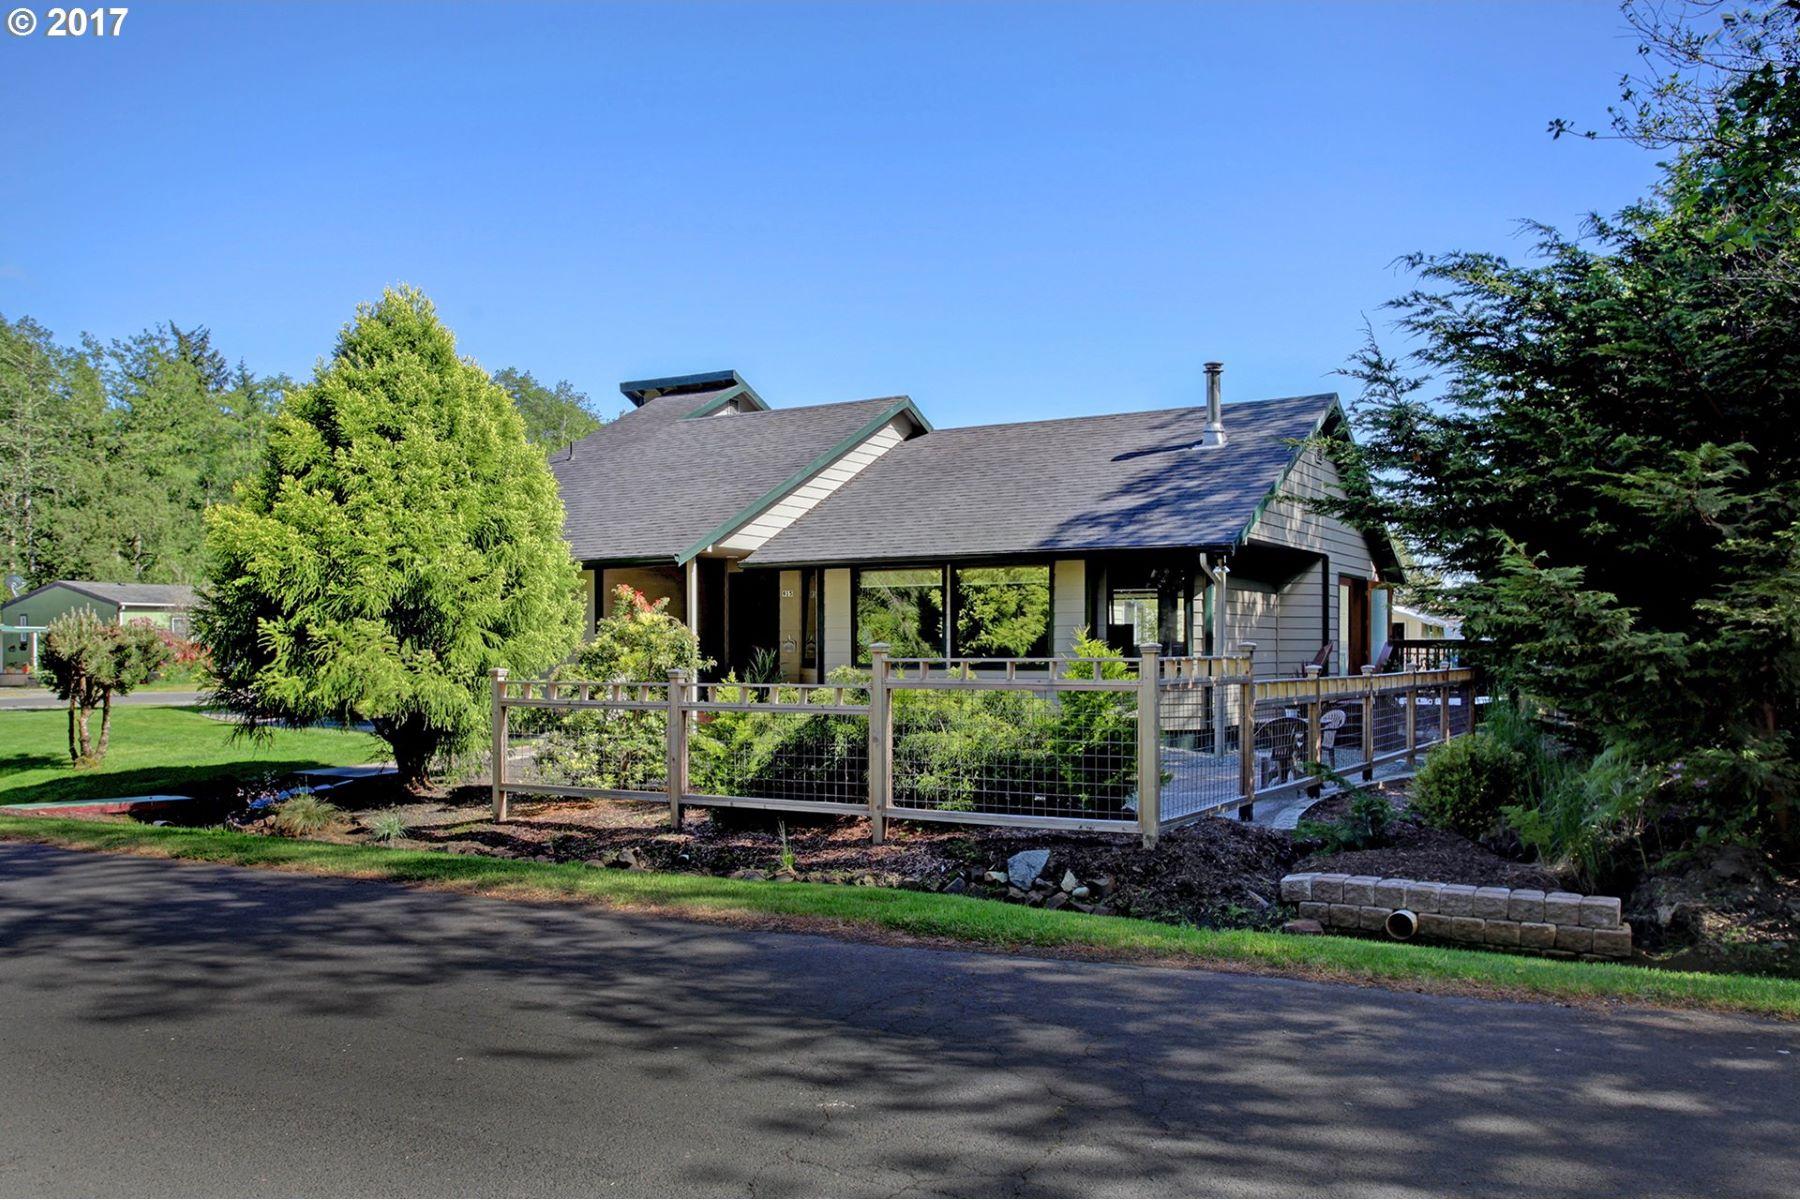 独户住宅 为 销售 在 Getaway to Fort Stevens State Park 915 King Salmon PL Hammond, 俄勒冈州, 97121 美国